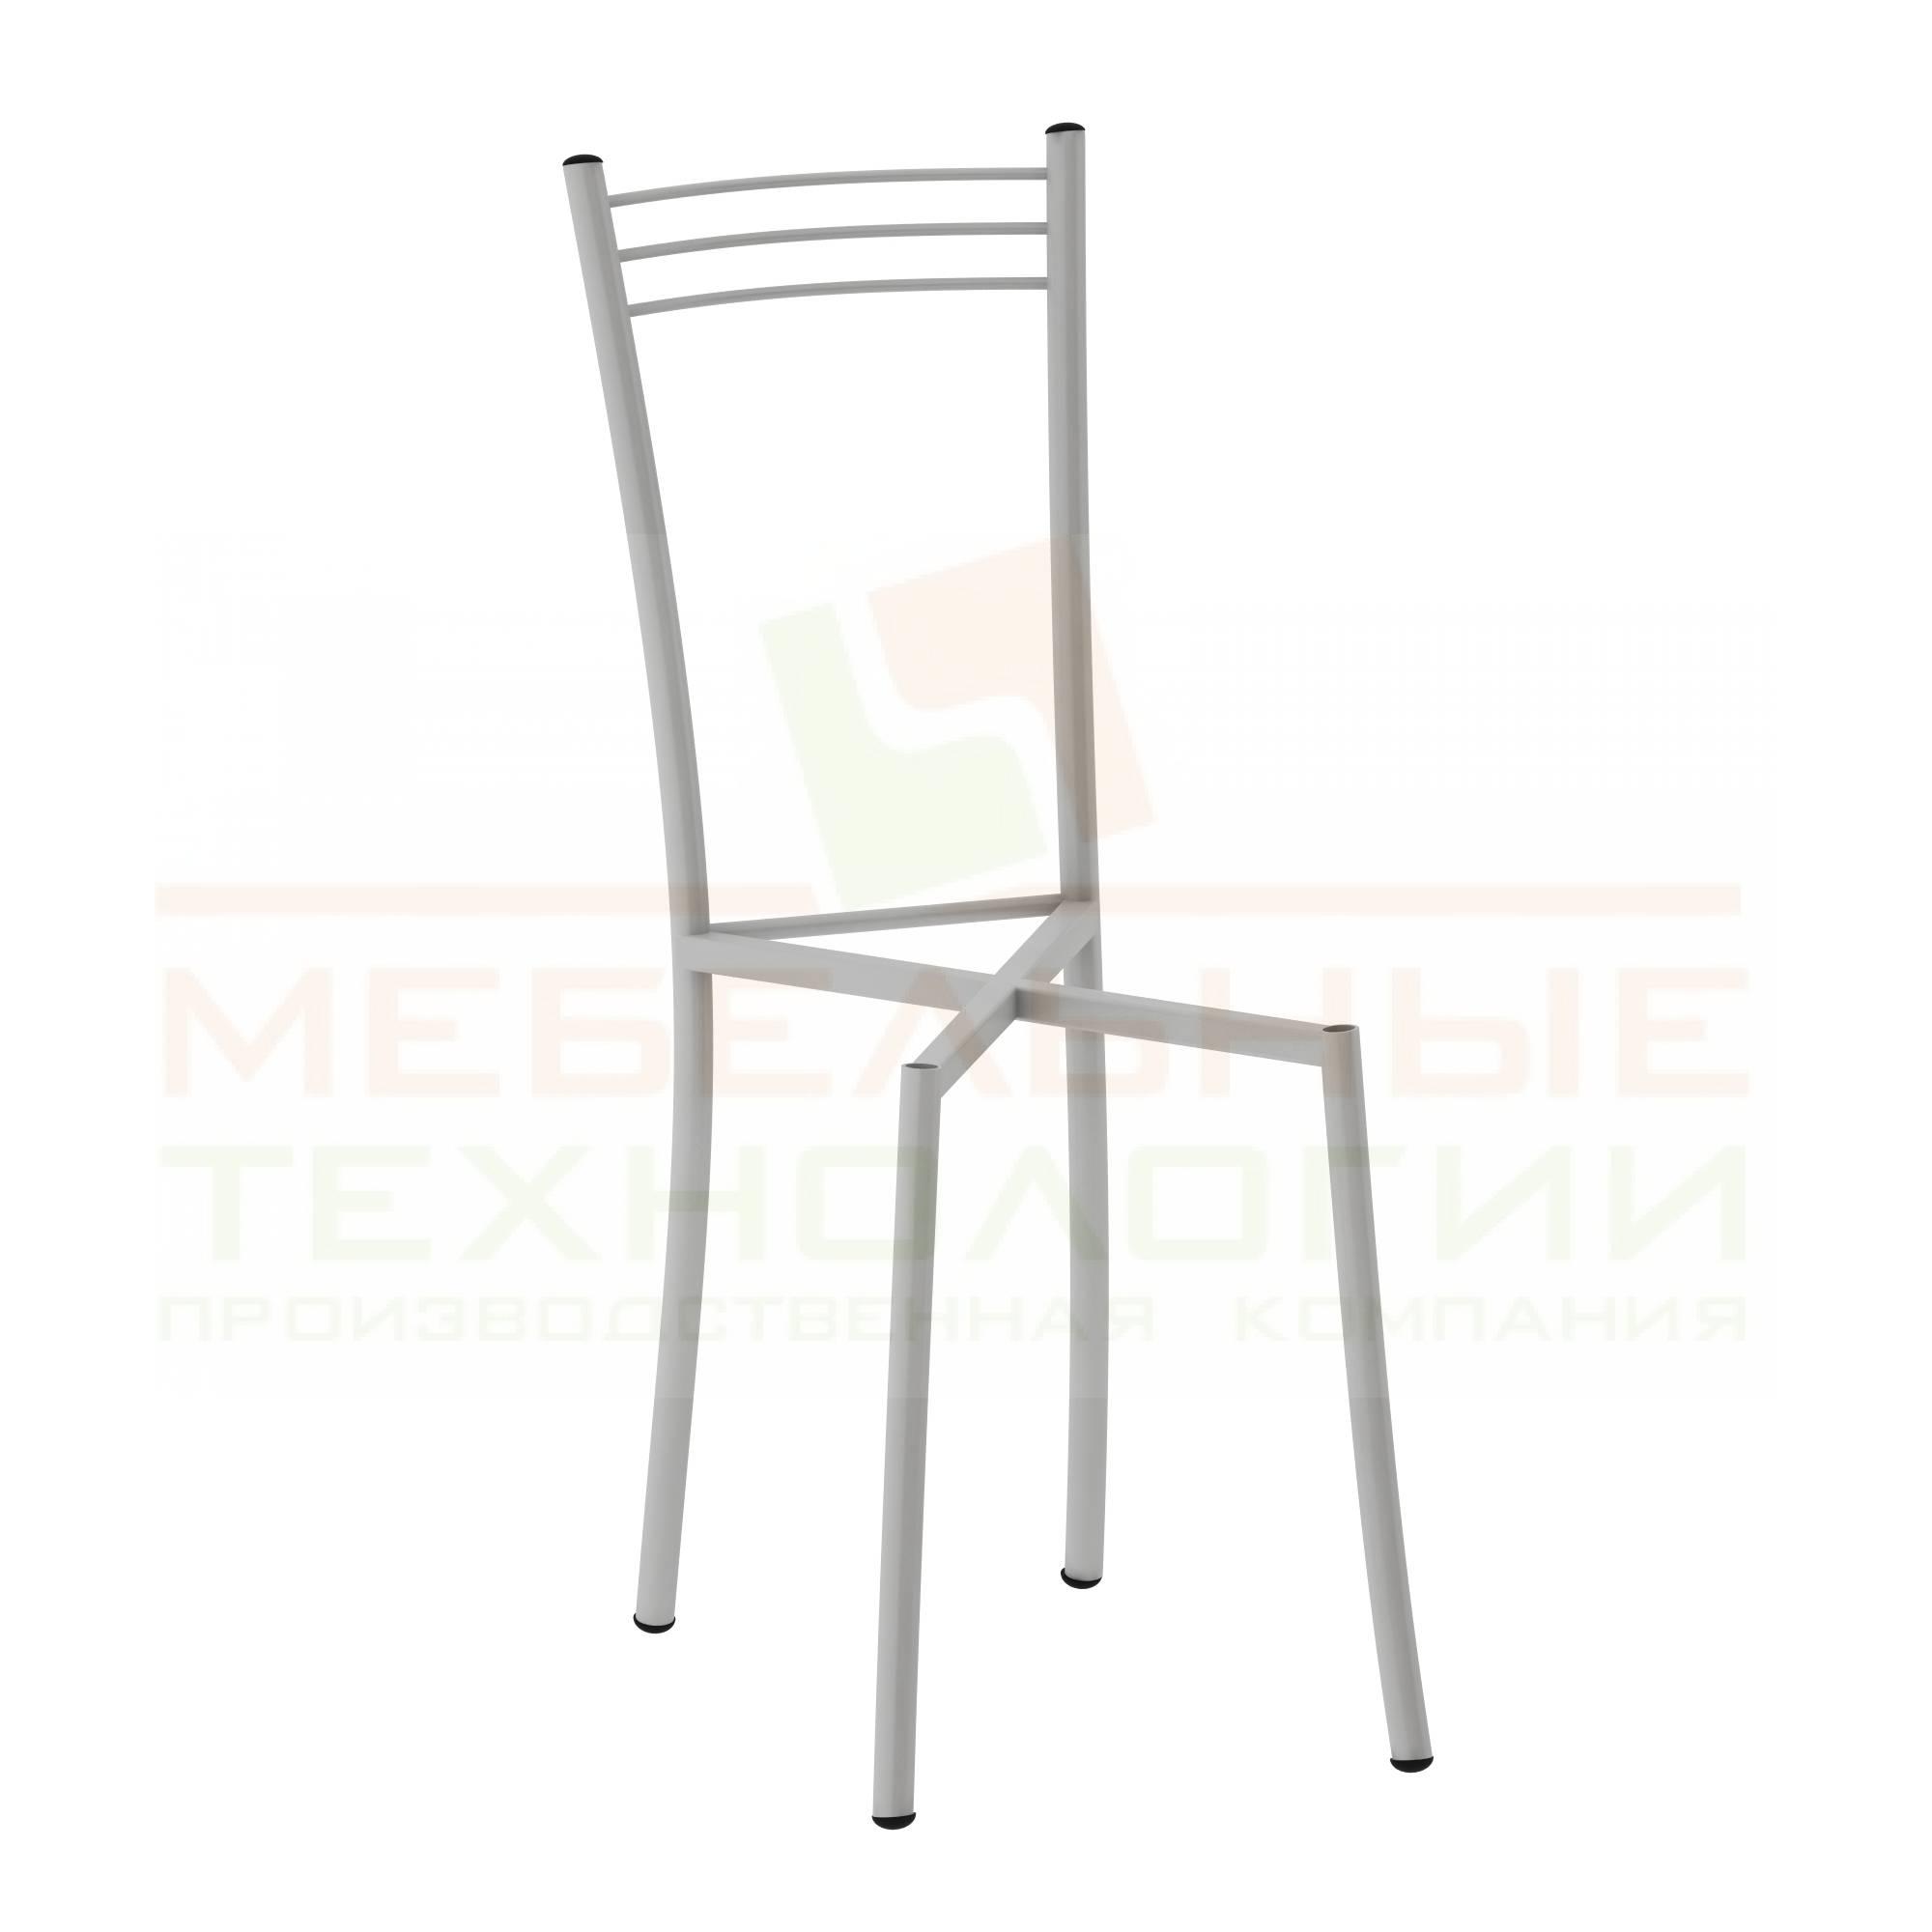 Каркасы кухонных стульев